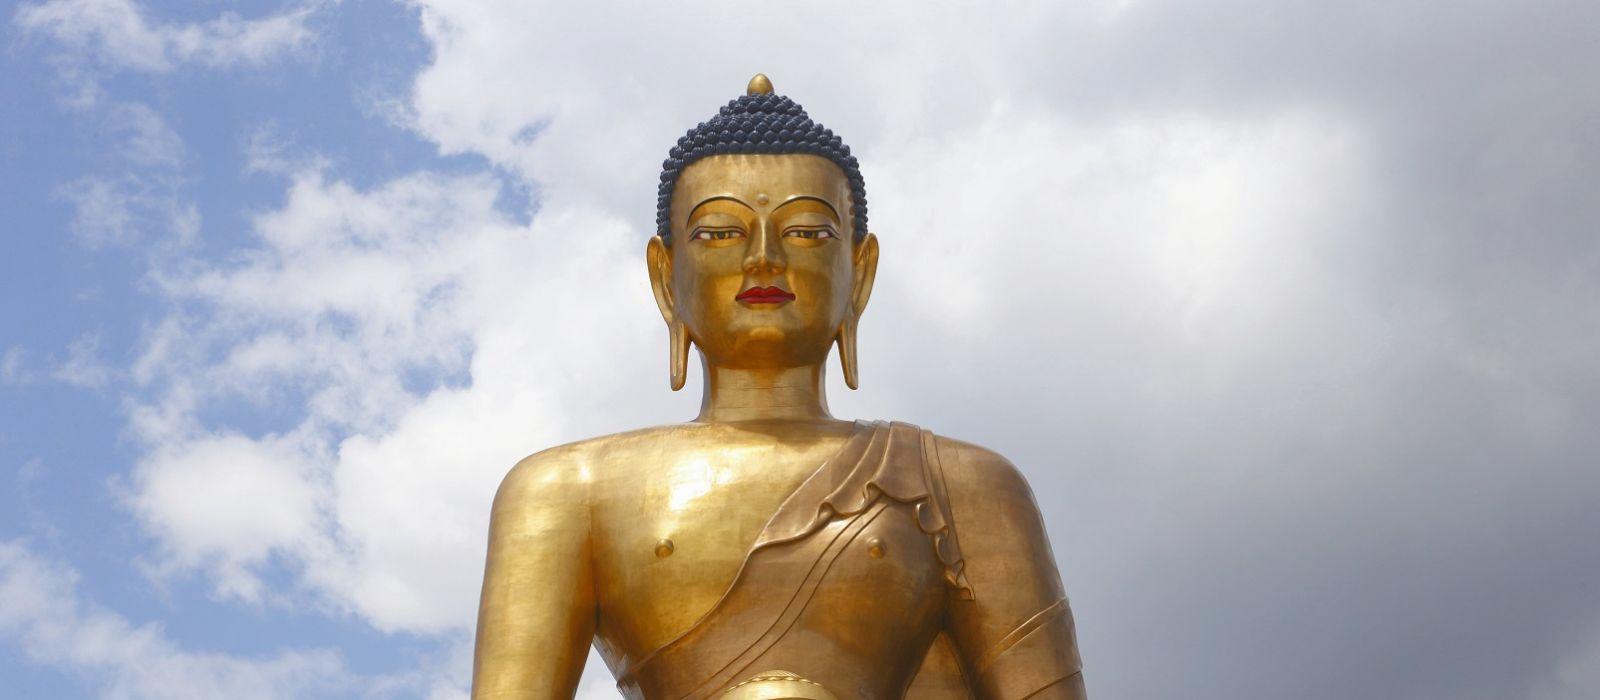 Amankora Exklusivangebot: Luxuriöses Bhutan Urlaub 4